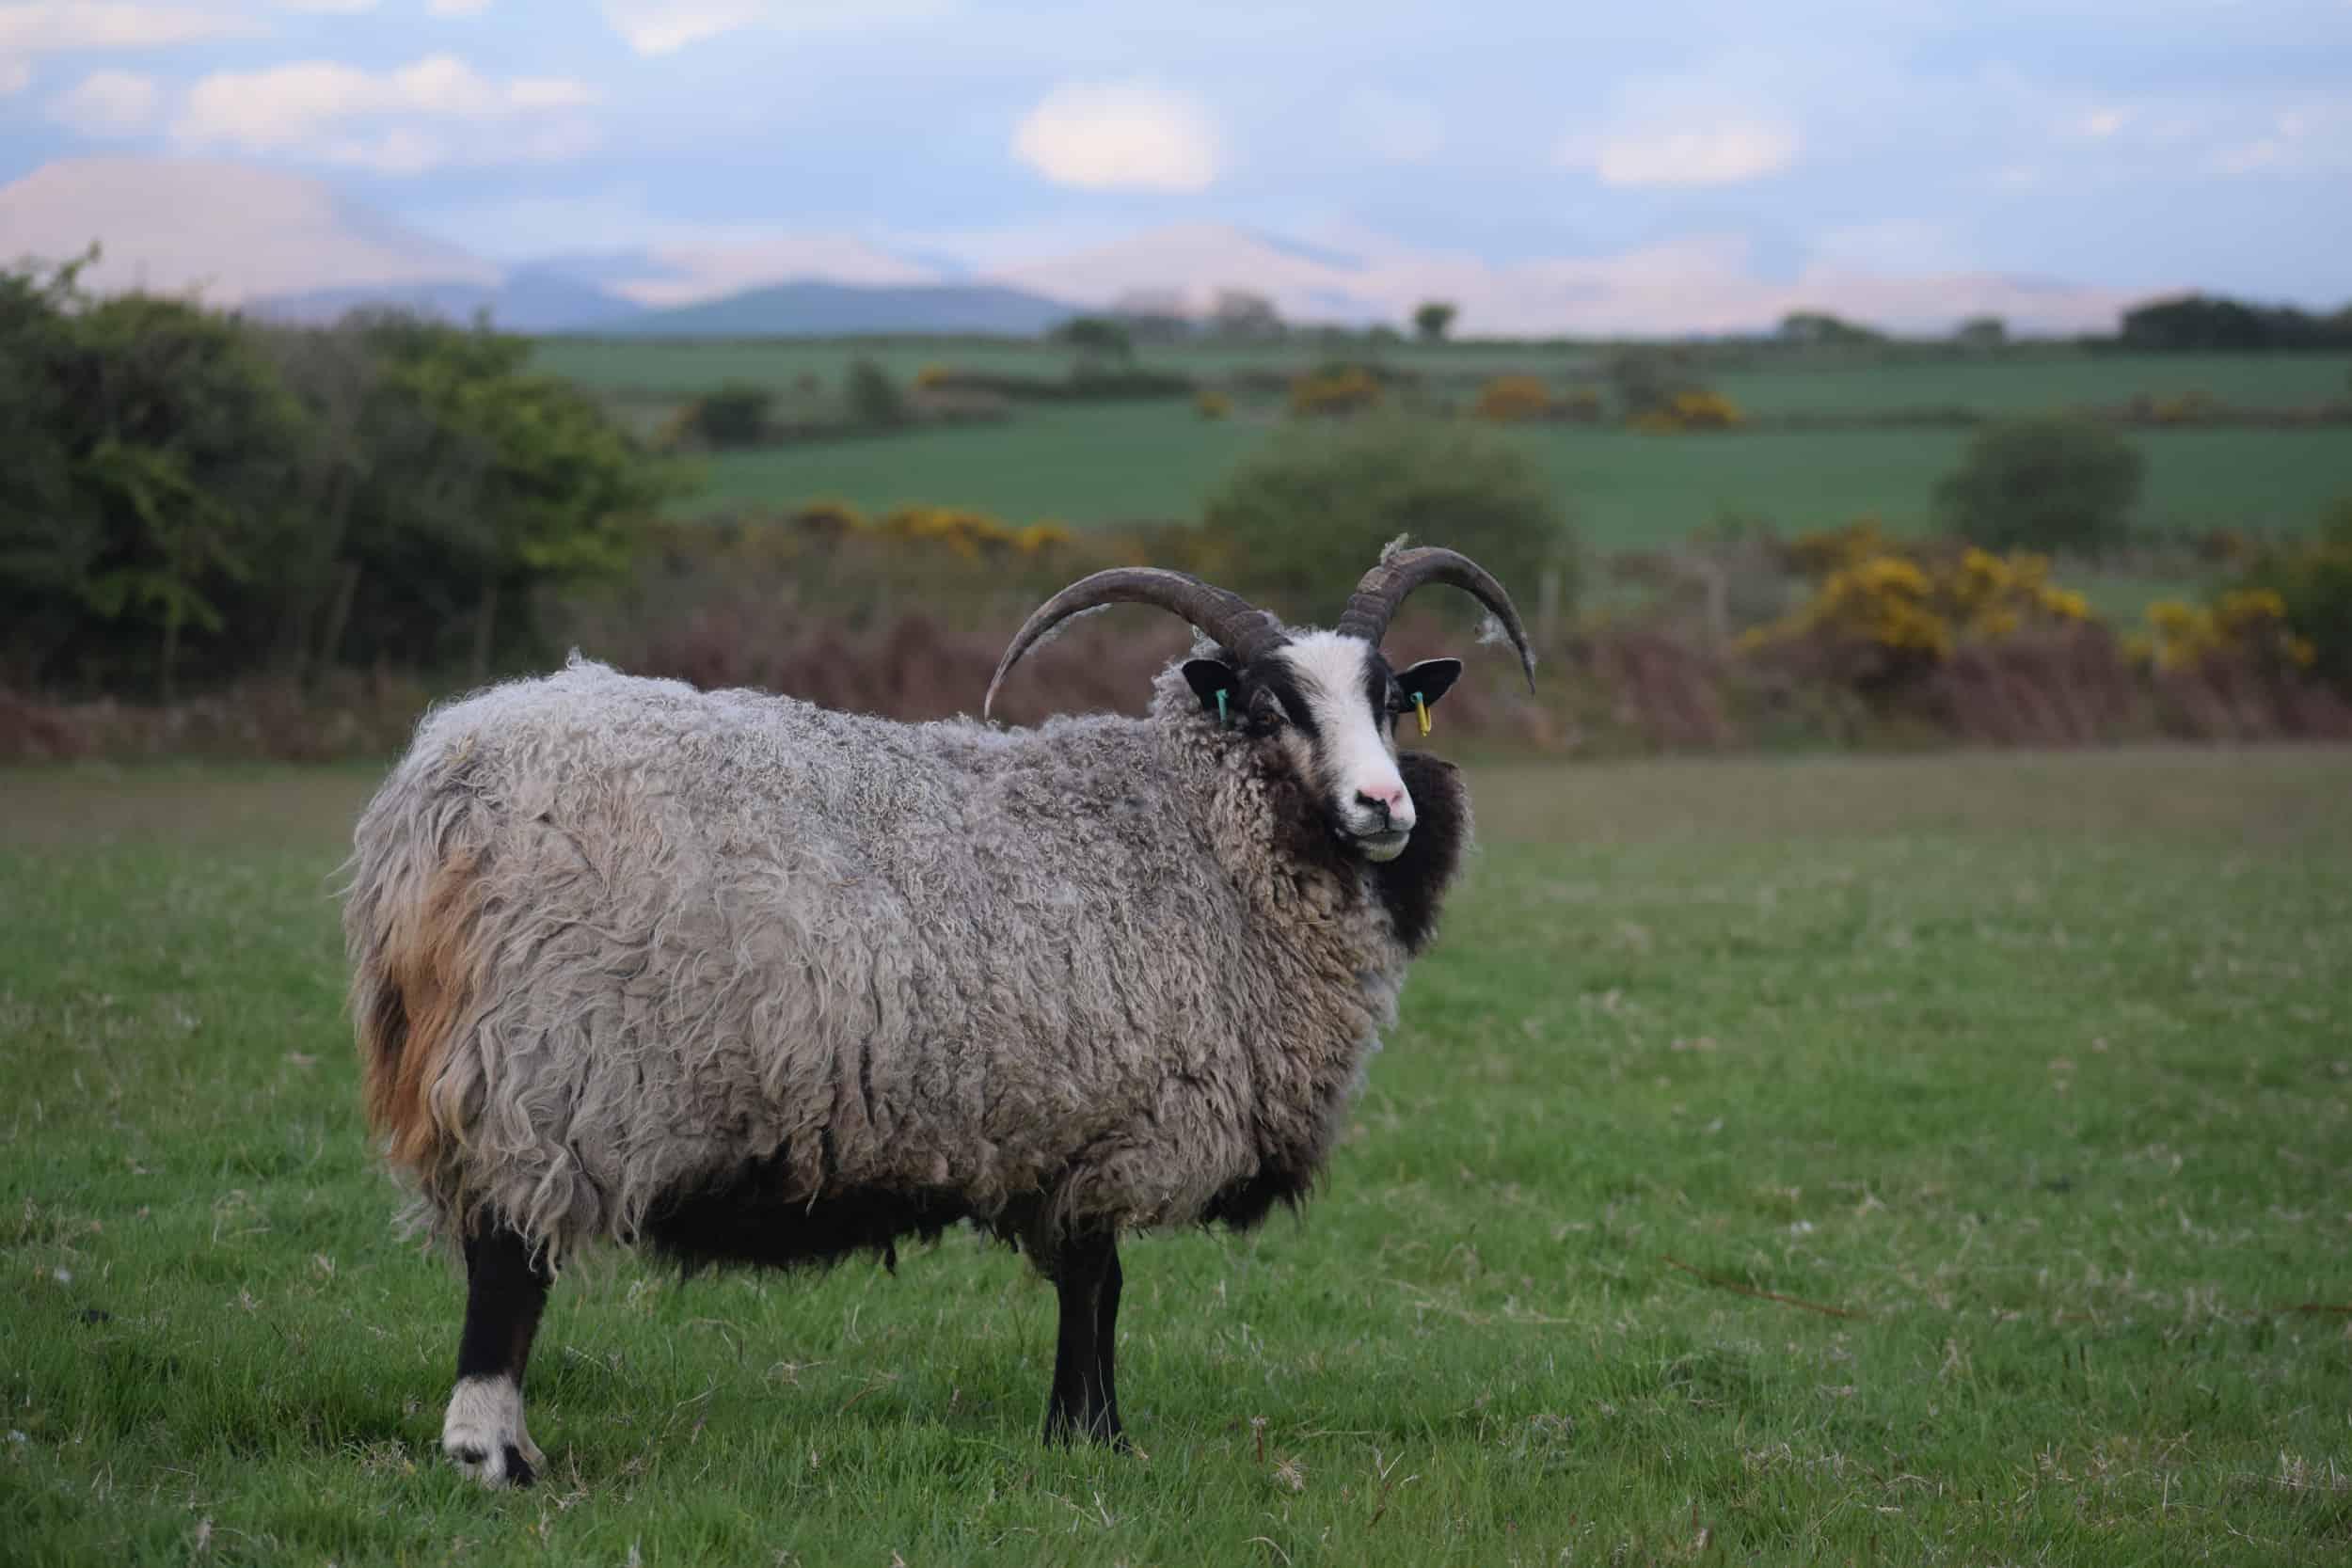 Poppy magnificent horns katmoget badgerface shetland cross jacob sheep lamb cute 2